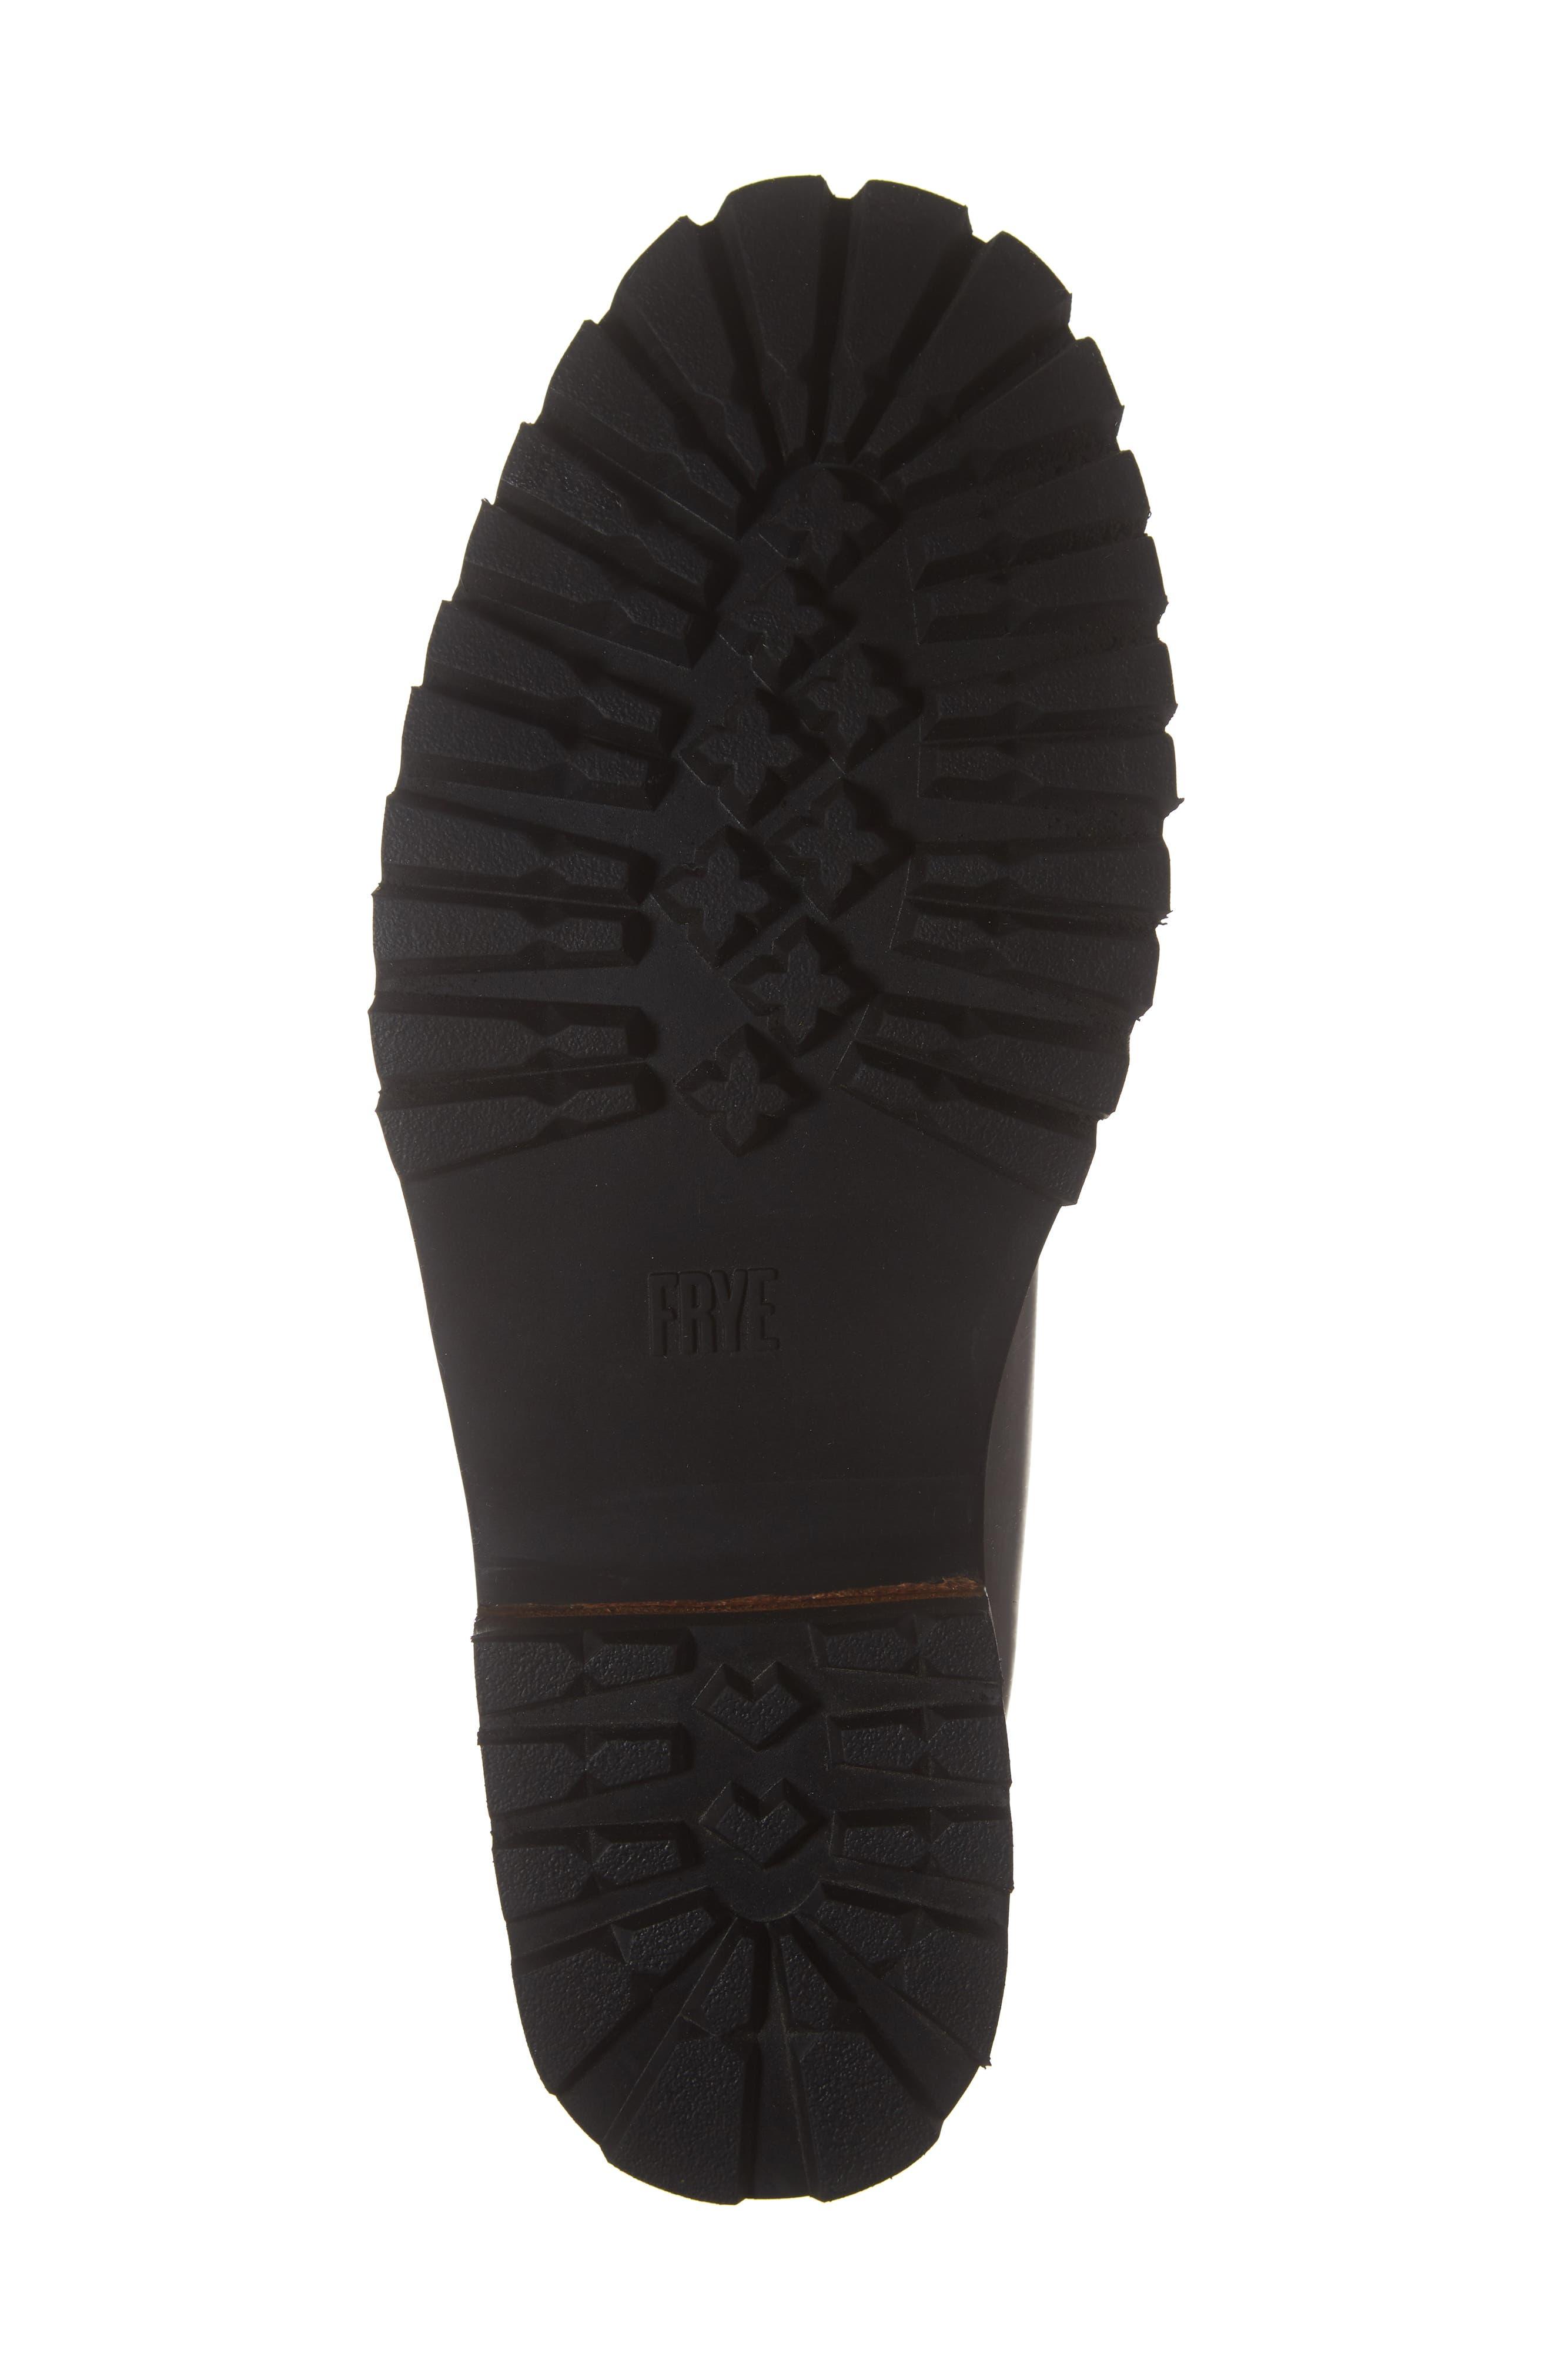 Union Plain Toe Boot,                             Alternate thumbnail 6, color,                             DARK BROWN